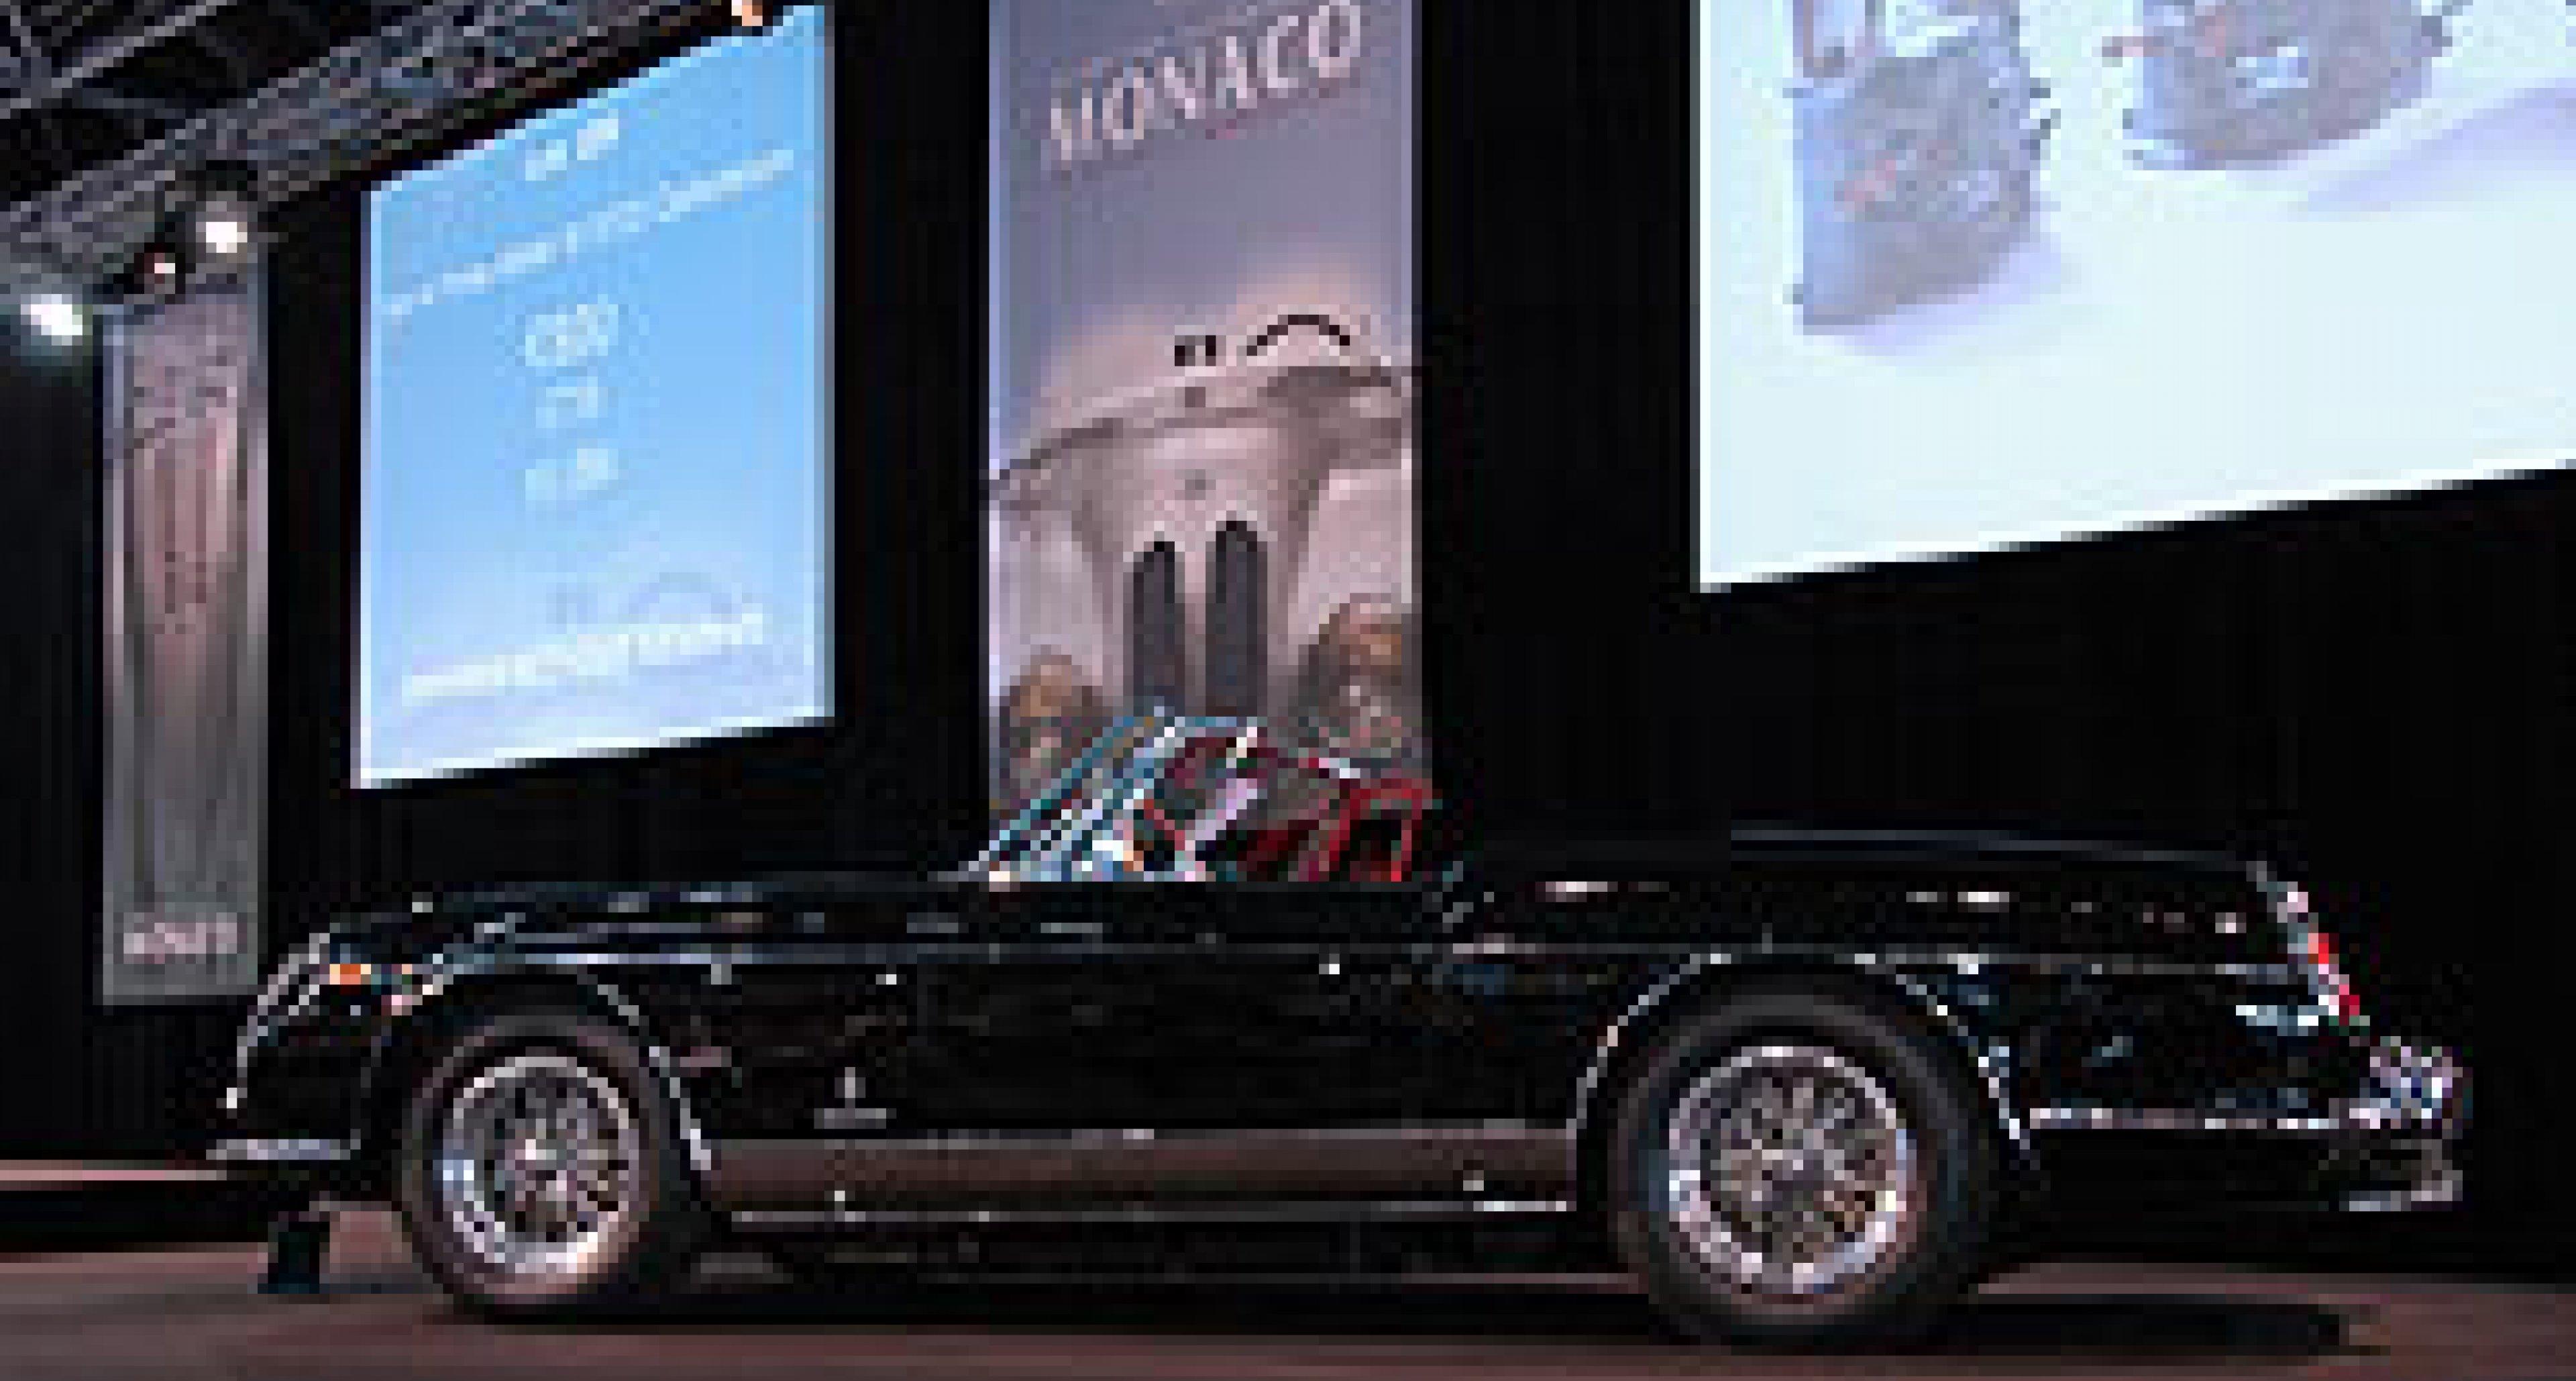 RM Auctions - 'Sporting Classics of Monaco' 1 May 2010 - Newsflash